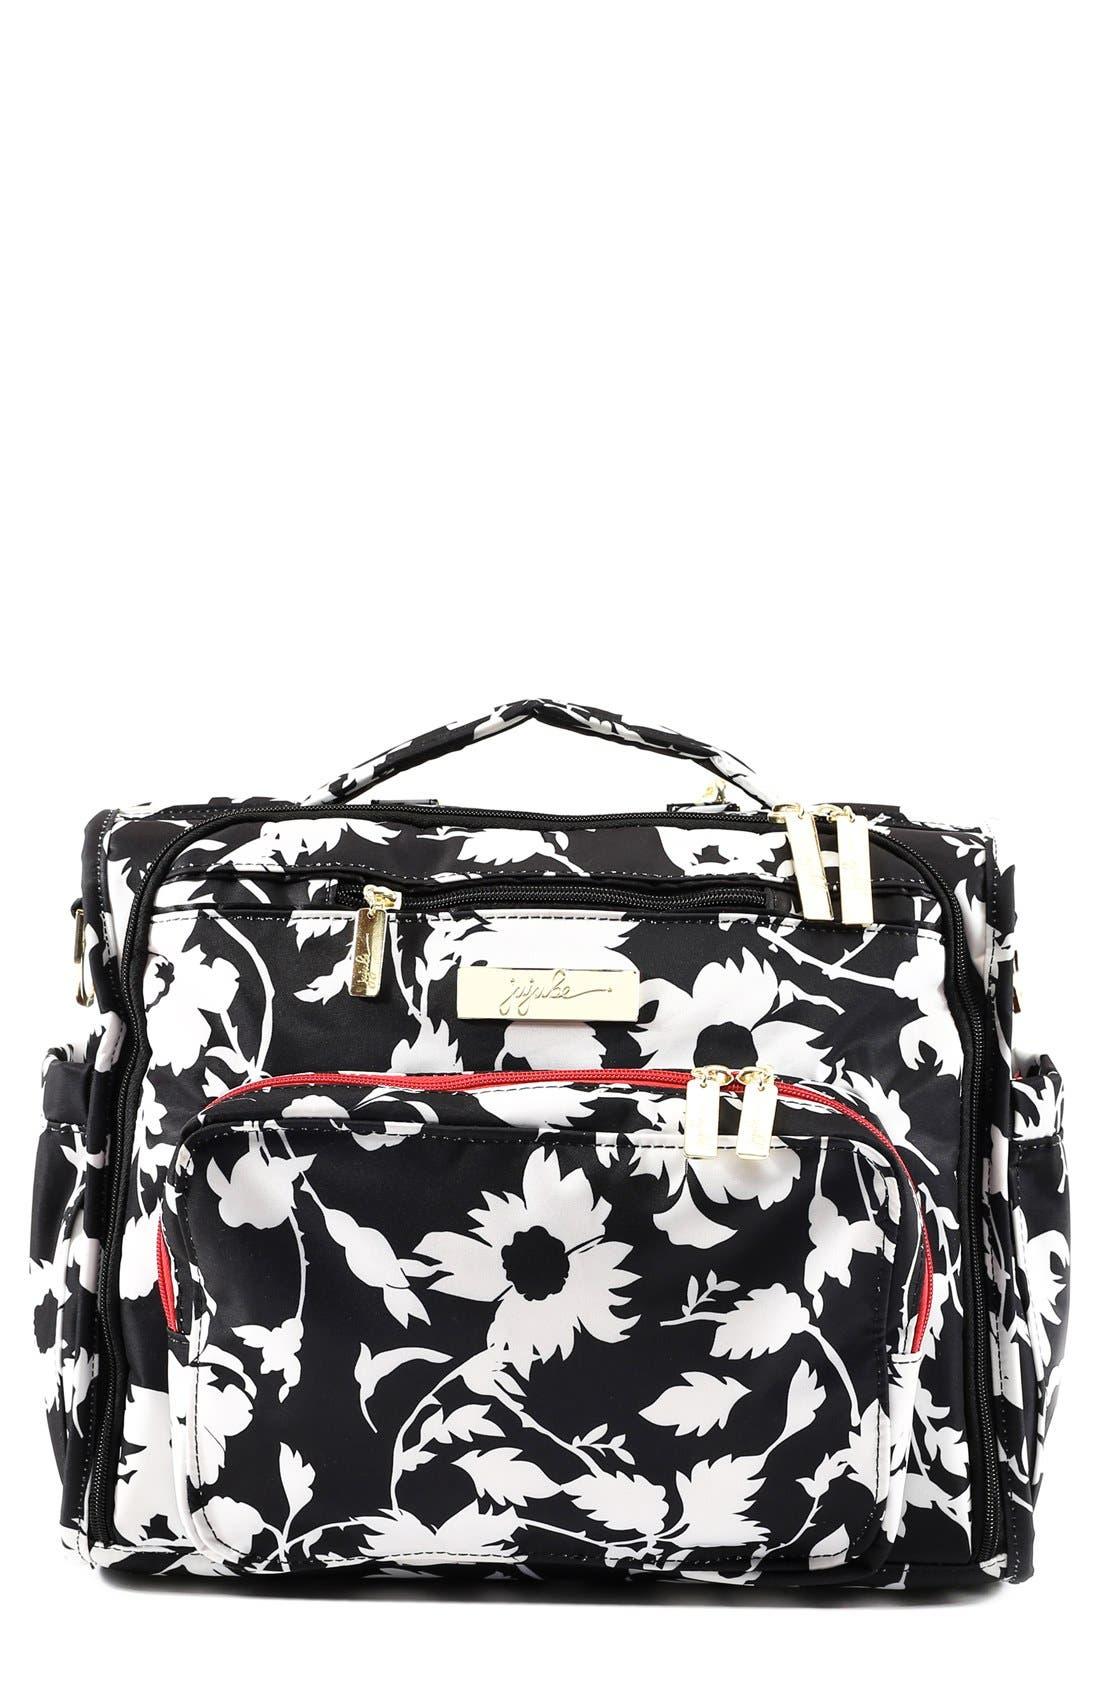 Ju-Ju-Be 'Legacy BFF' Diaper Bag